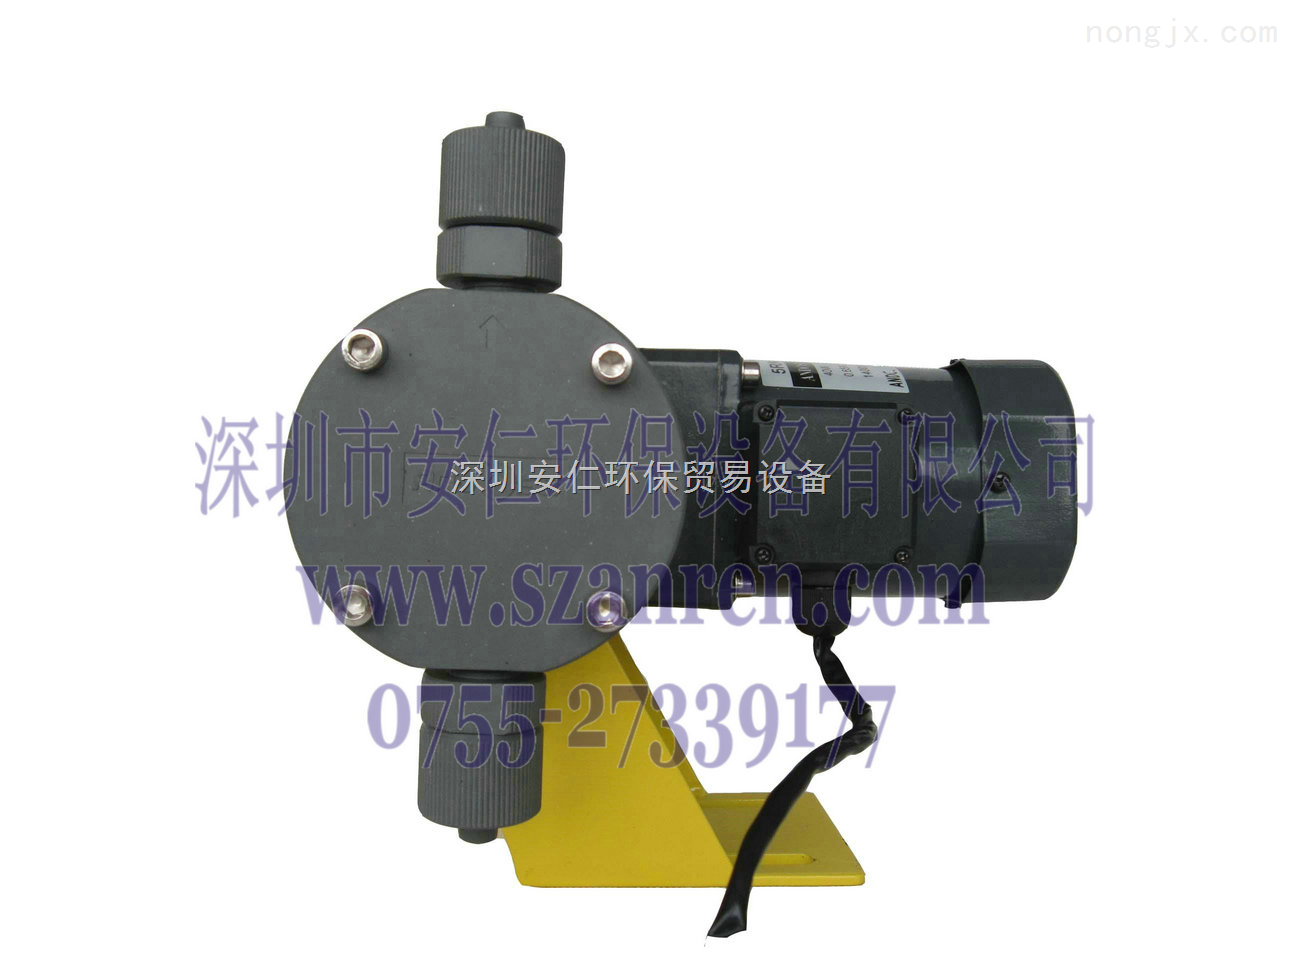 MS1A094A-专业销售意大利正品MS1A094A隔膜计量泵,直销价格便宜